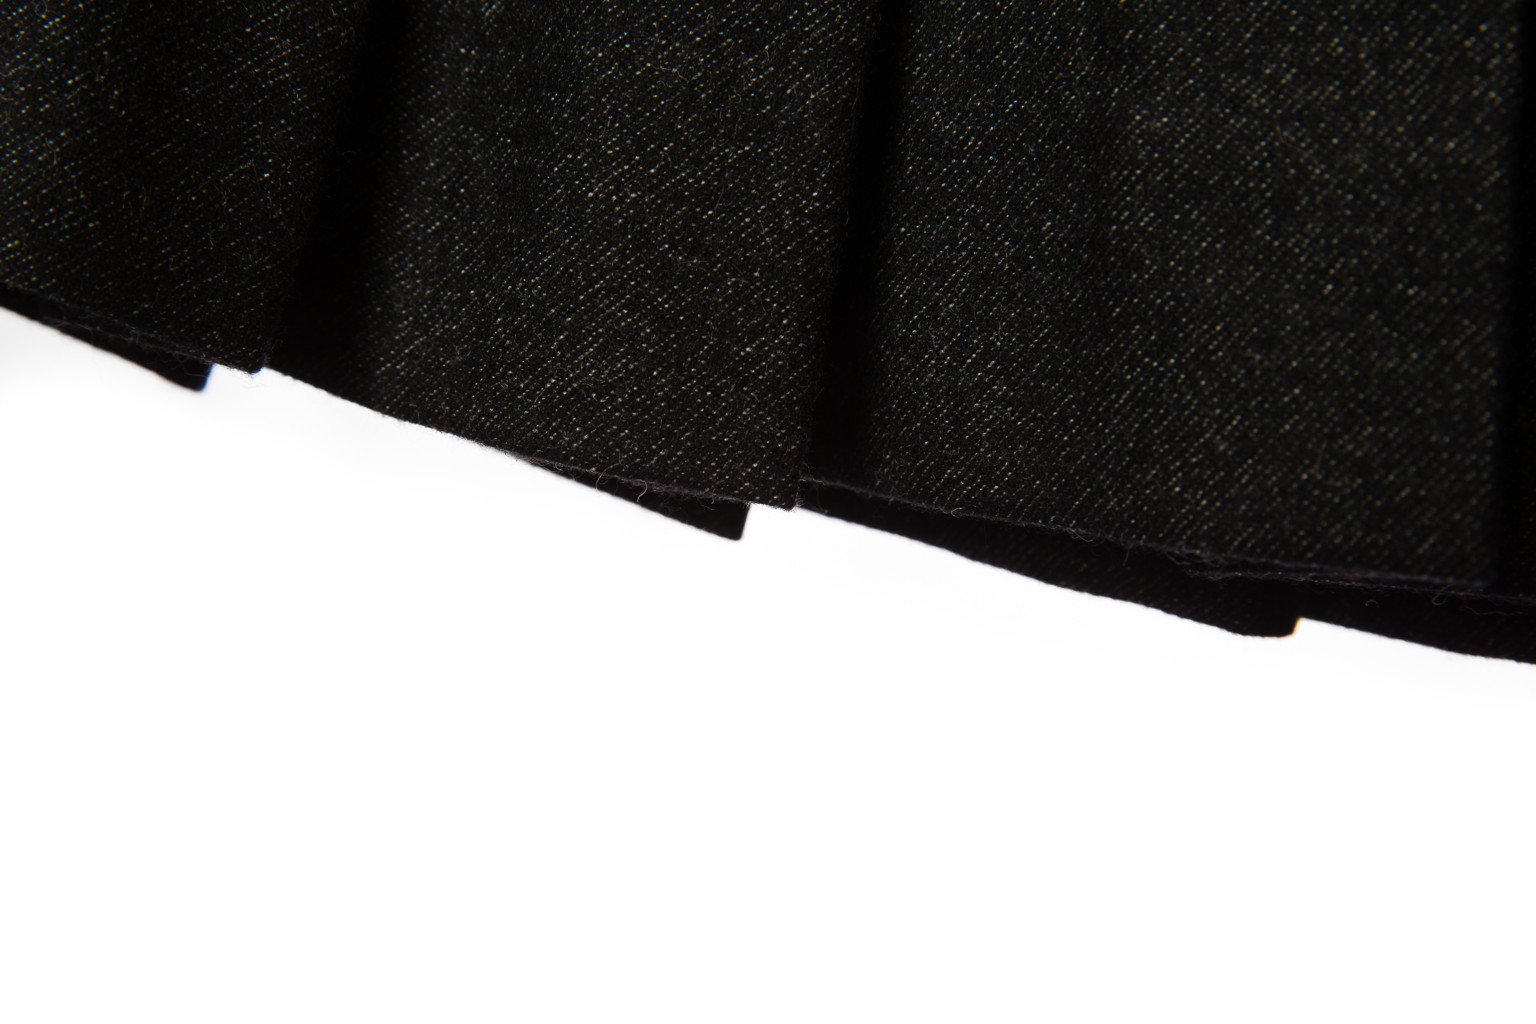 Кокетливая черная юбка в складку от Chanel, 40 размер